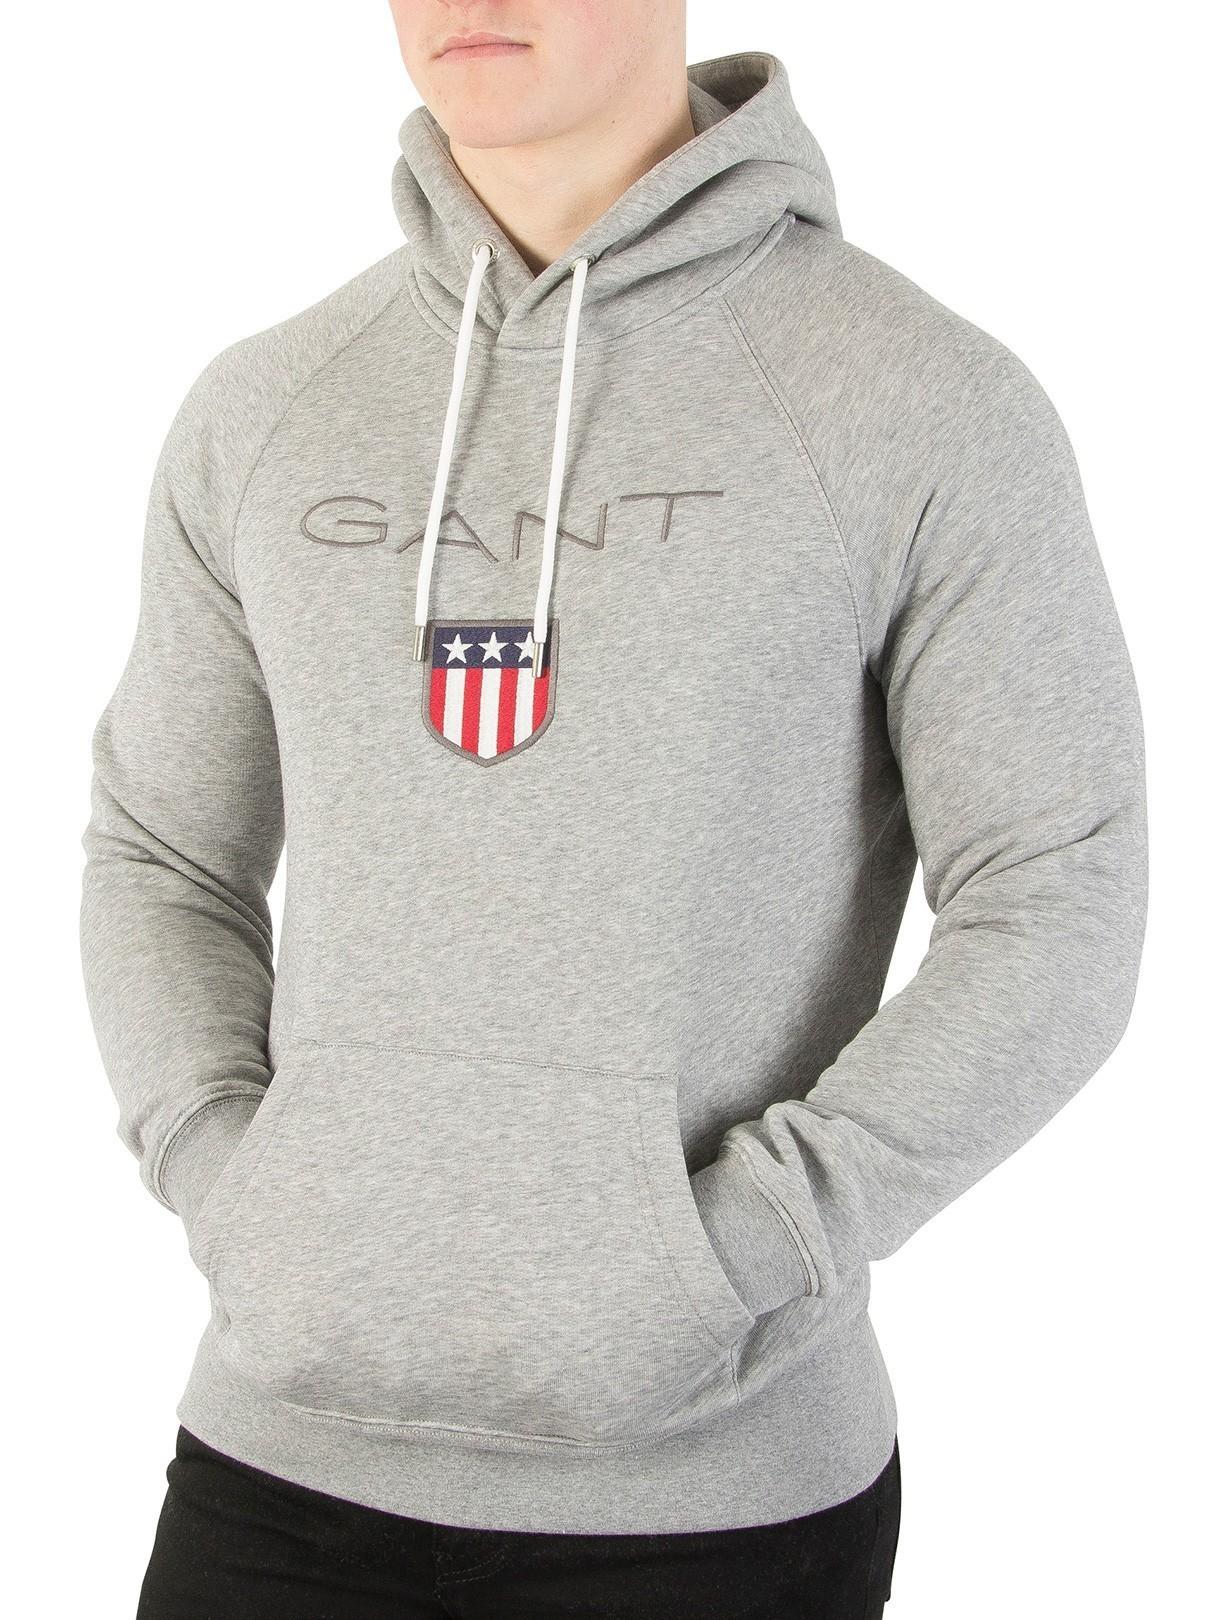 55bd3ddf Gant Grey Melange Shield Pullover Hoodie | Standout